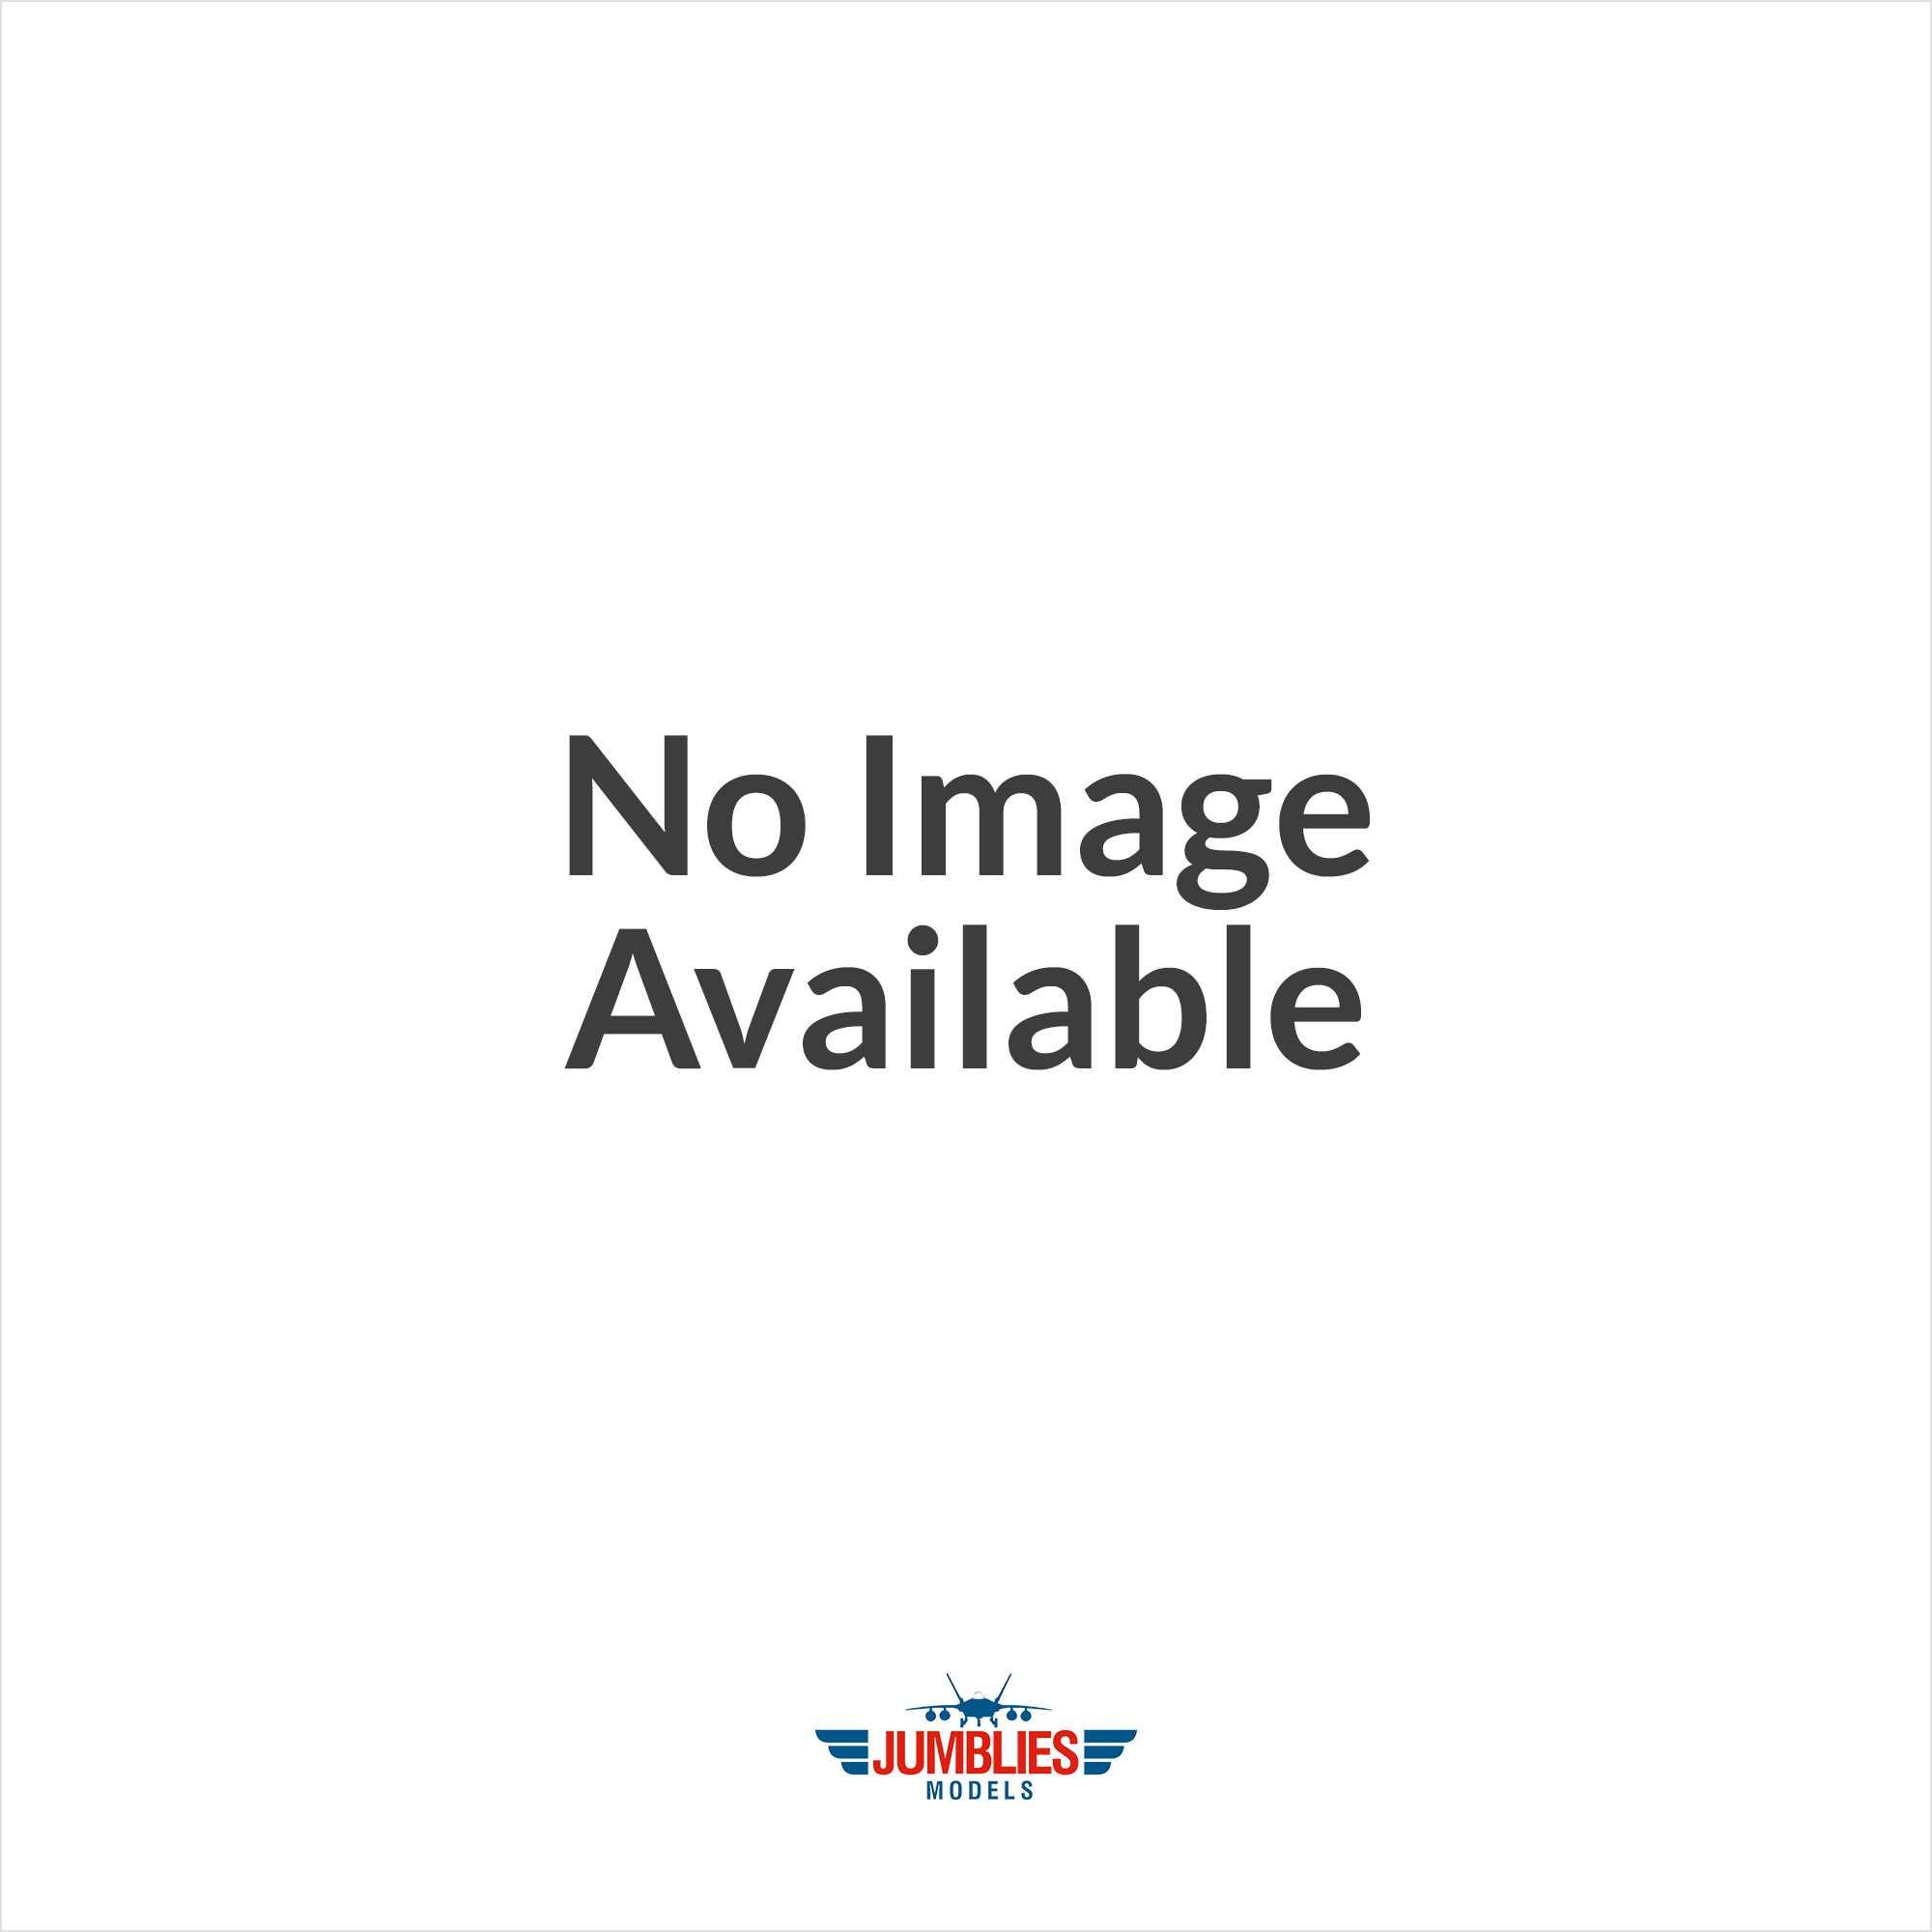 Minichamps Yamaha Ytz-M1 Monster Yamaha Tech 3 - Bradley Smith MotoGP 2014 - 1:12 Scale Diecast Model